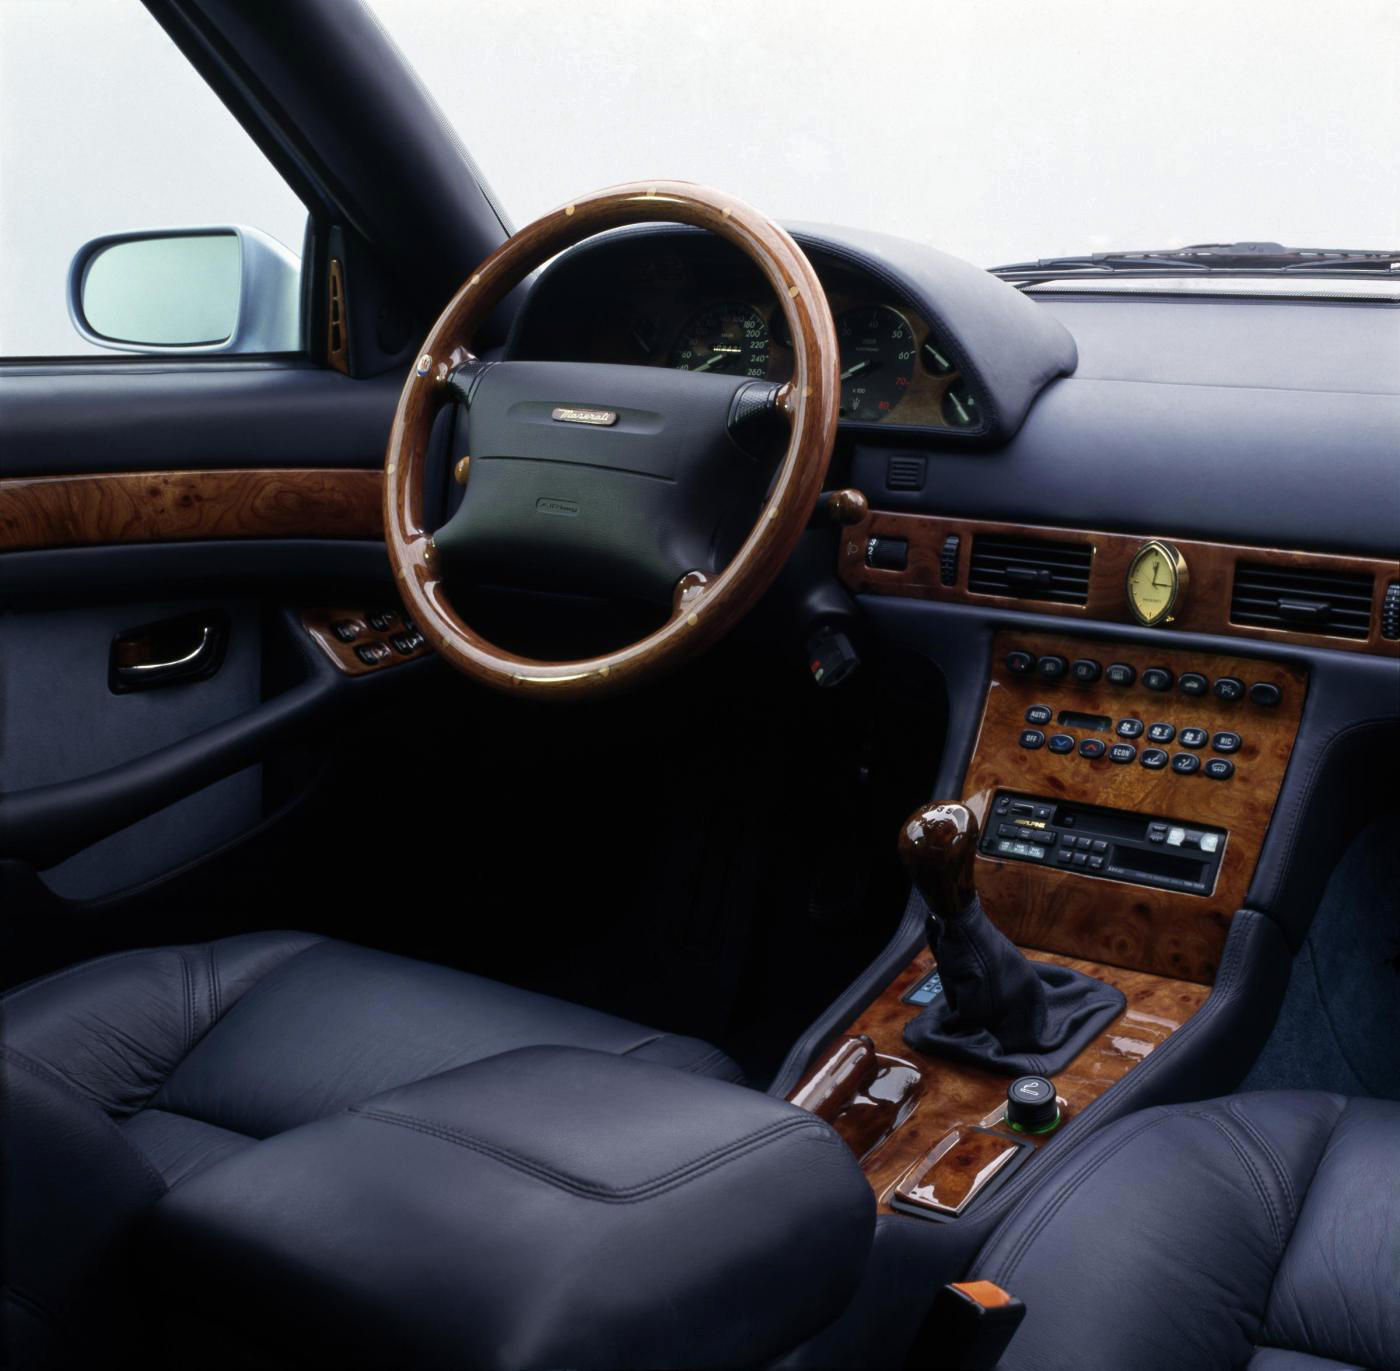 1994 Maserati Quattroporte IV - interior view of the 5-seater sedan